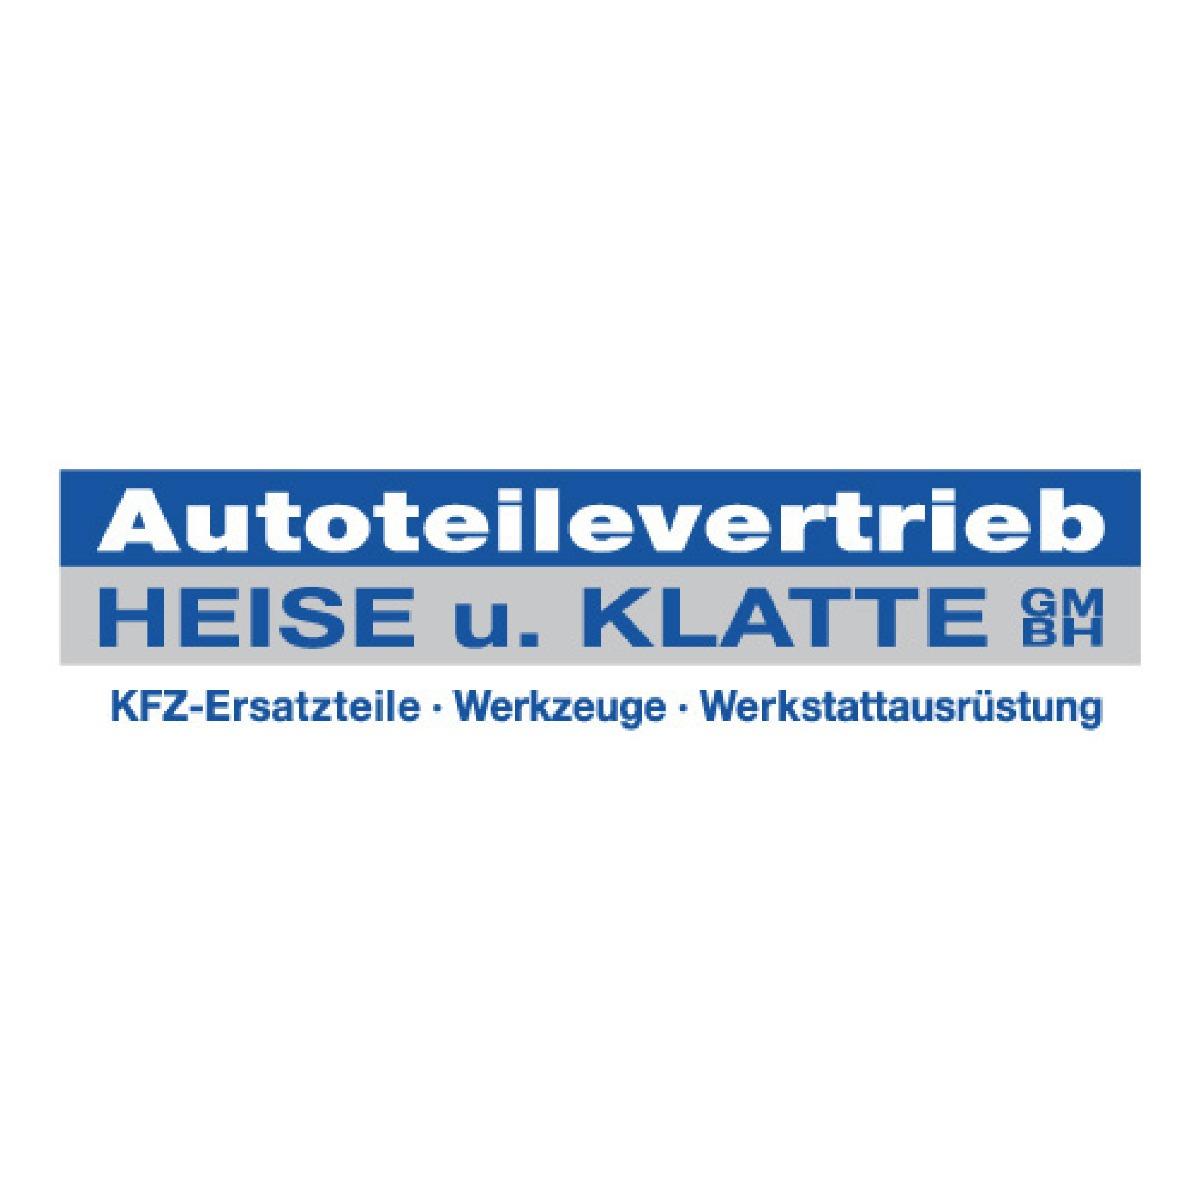 Heise & Klatte GmbH